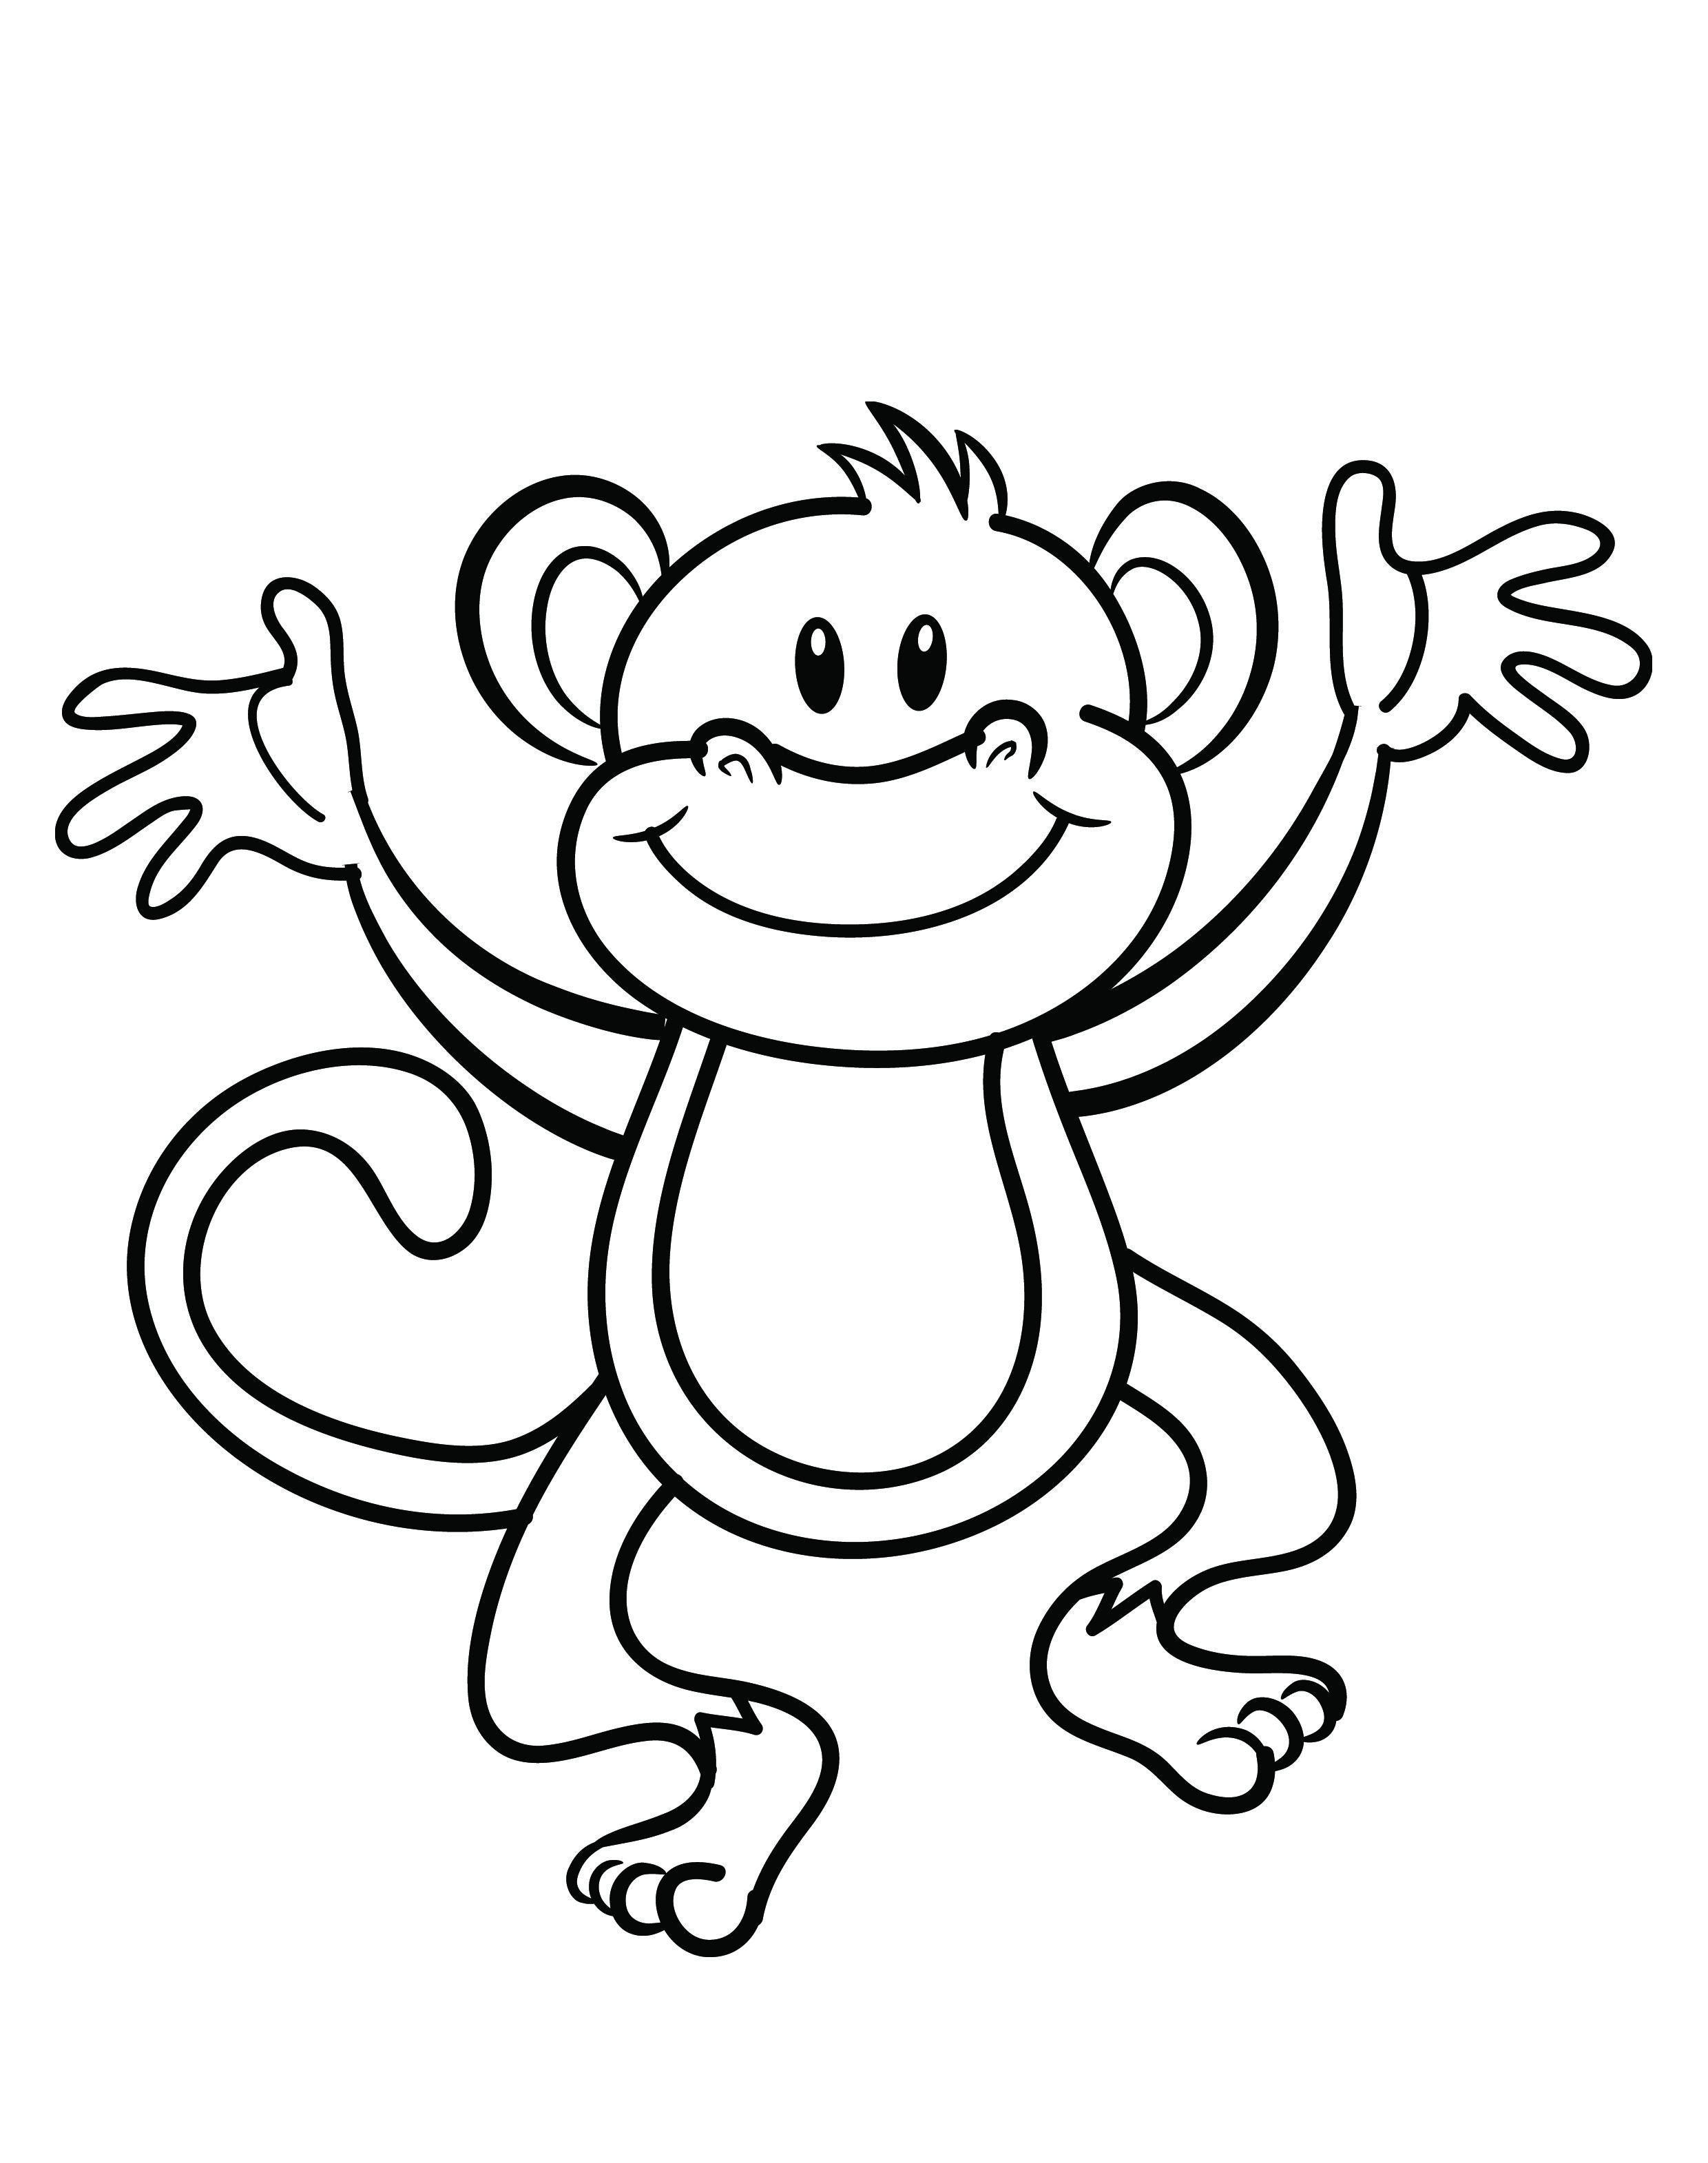 free printable monkey coloring page  monkey coloring